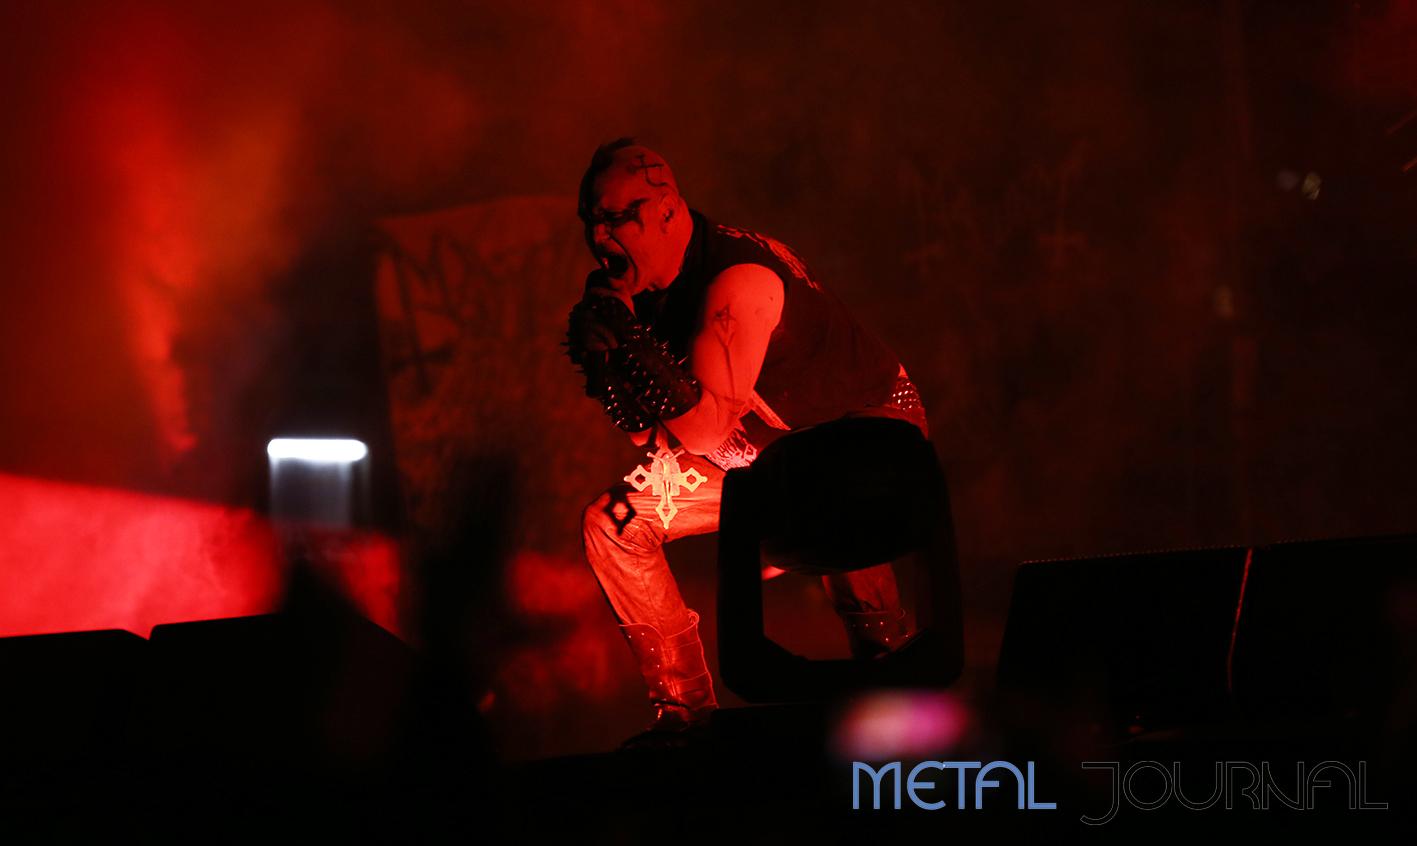 mayhem metal journal rock the coast 2019 pic 4